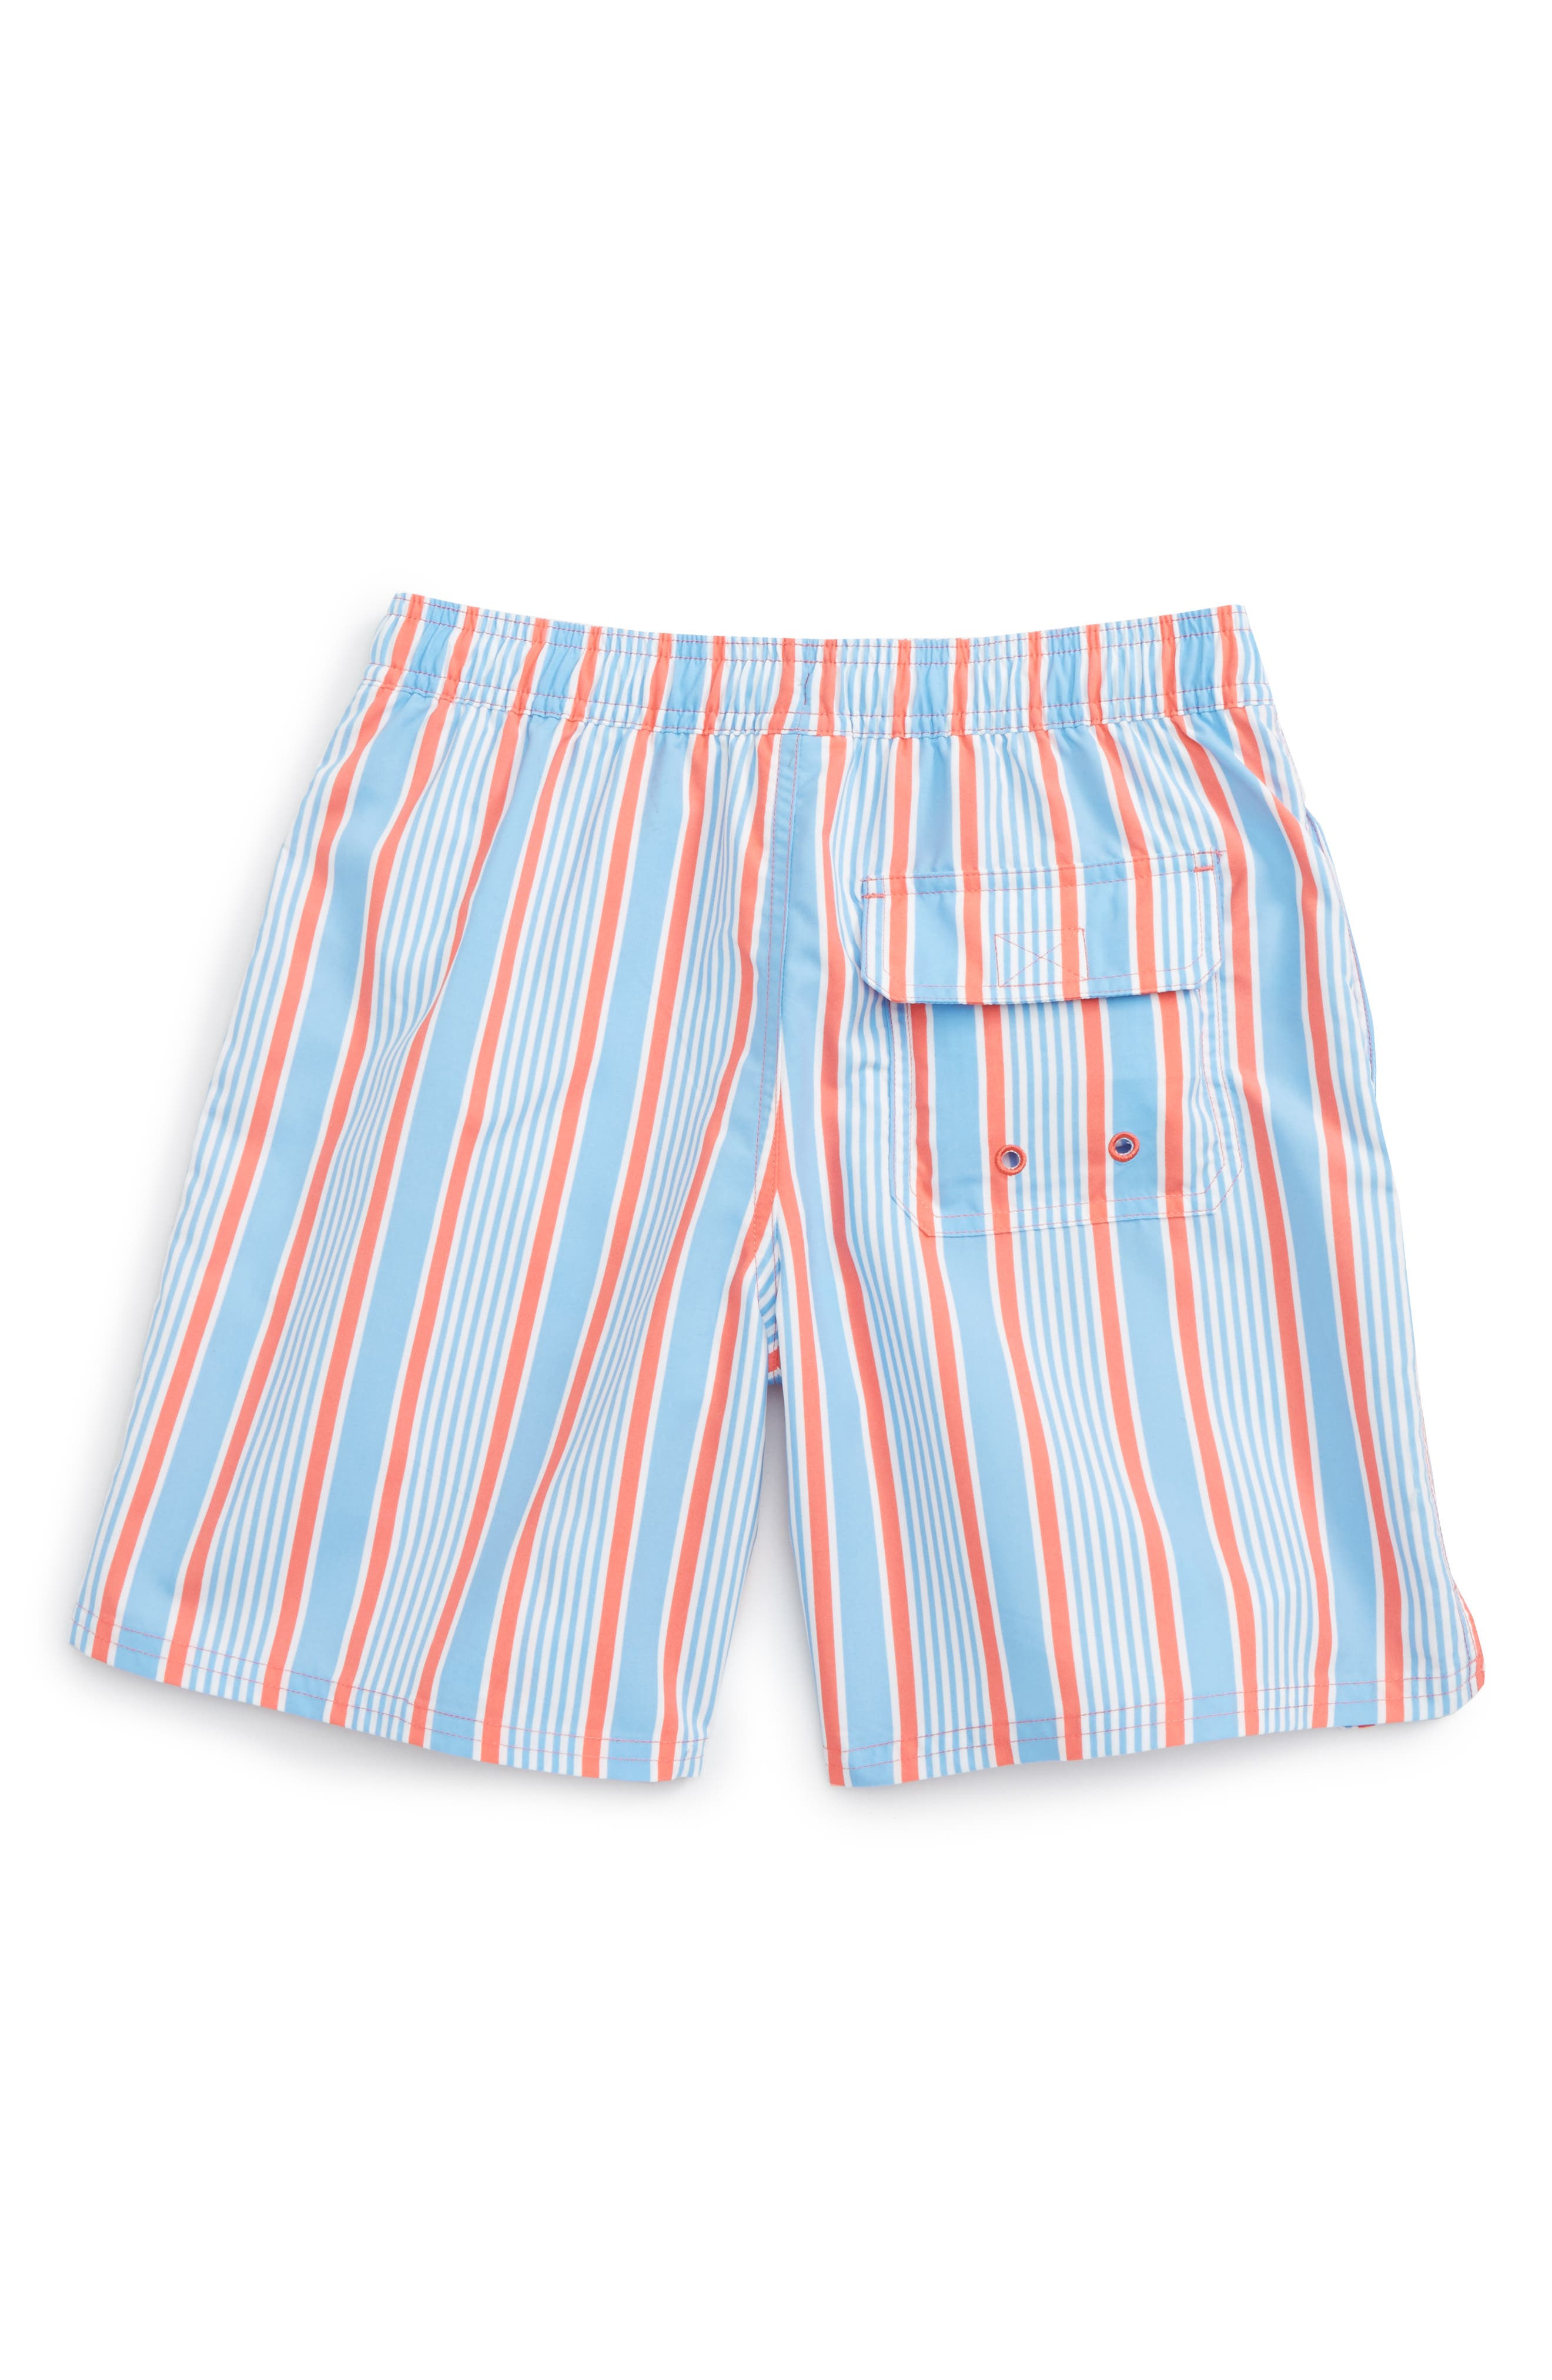 VINEYARD VINES,                             Stripe Bungalow Swim Trunks,                             Main thumbnail 1, color,                             669